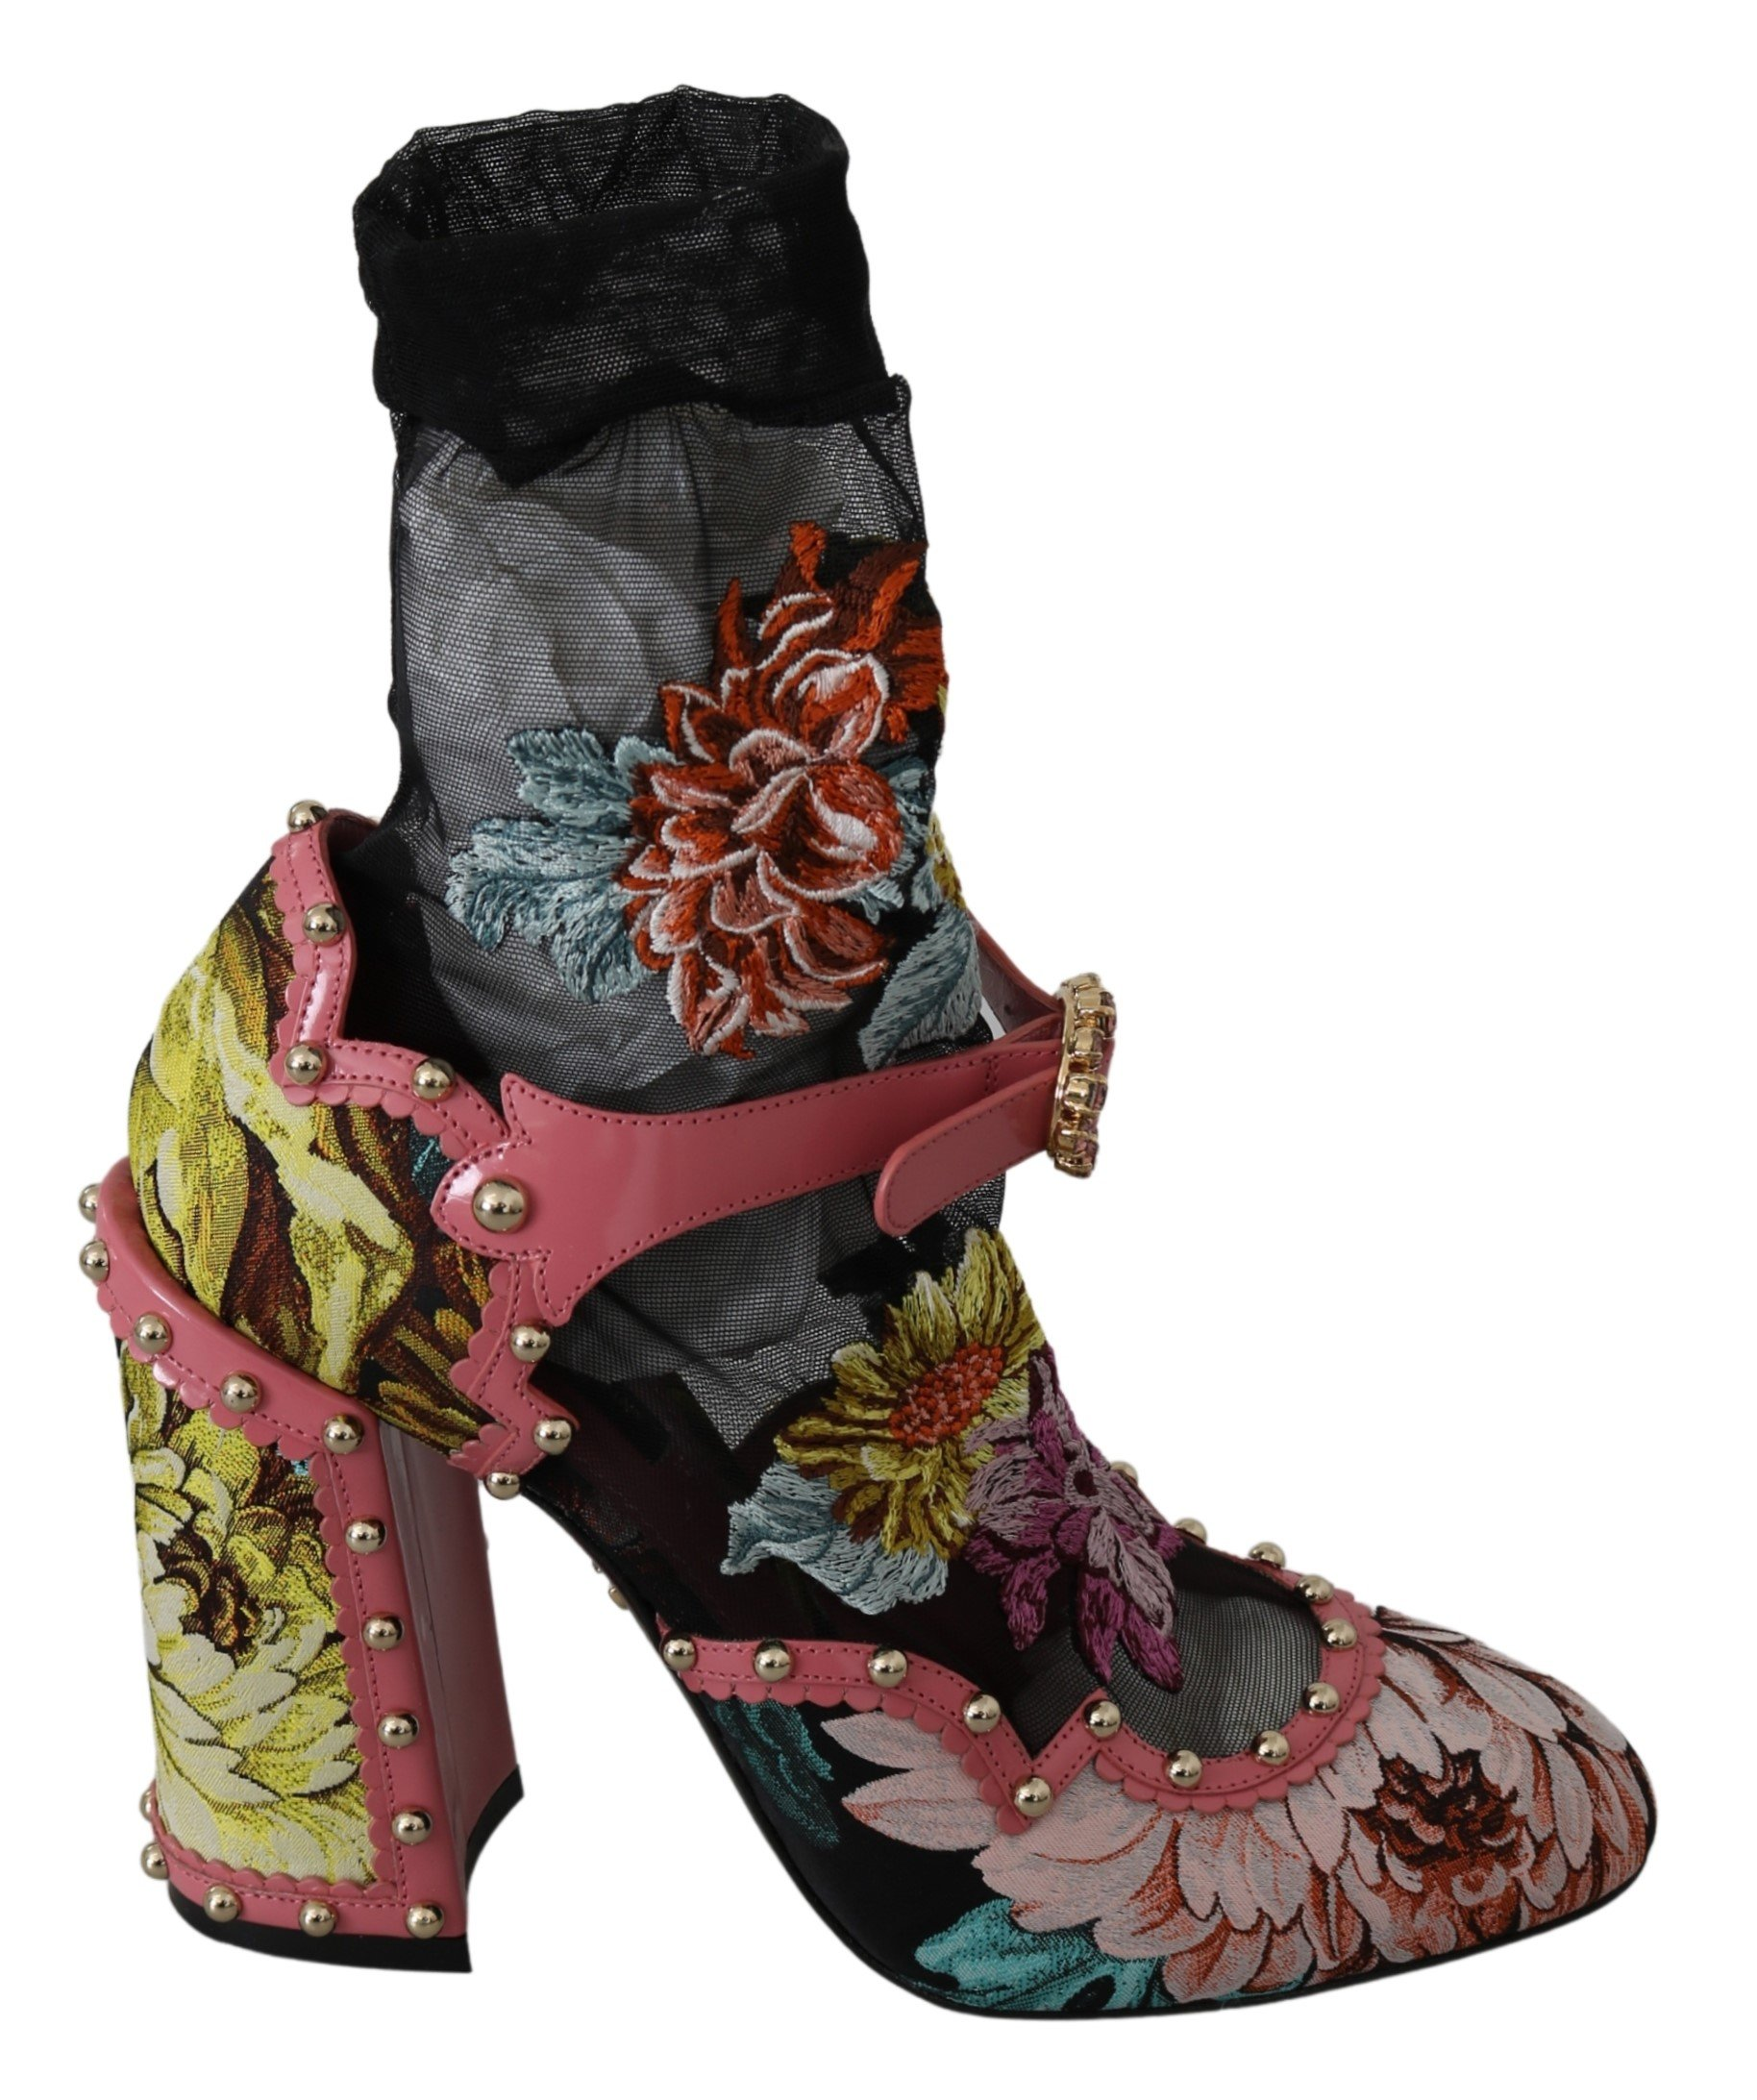 Dolce & Gabbana Women's Leather Crystal Pumps Multicolor LA7260 - EU39/US8.5